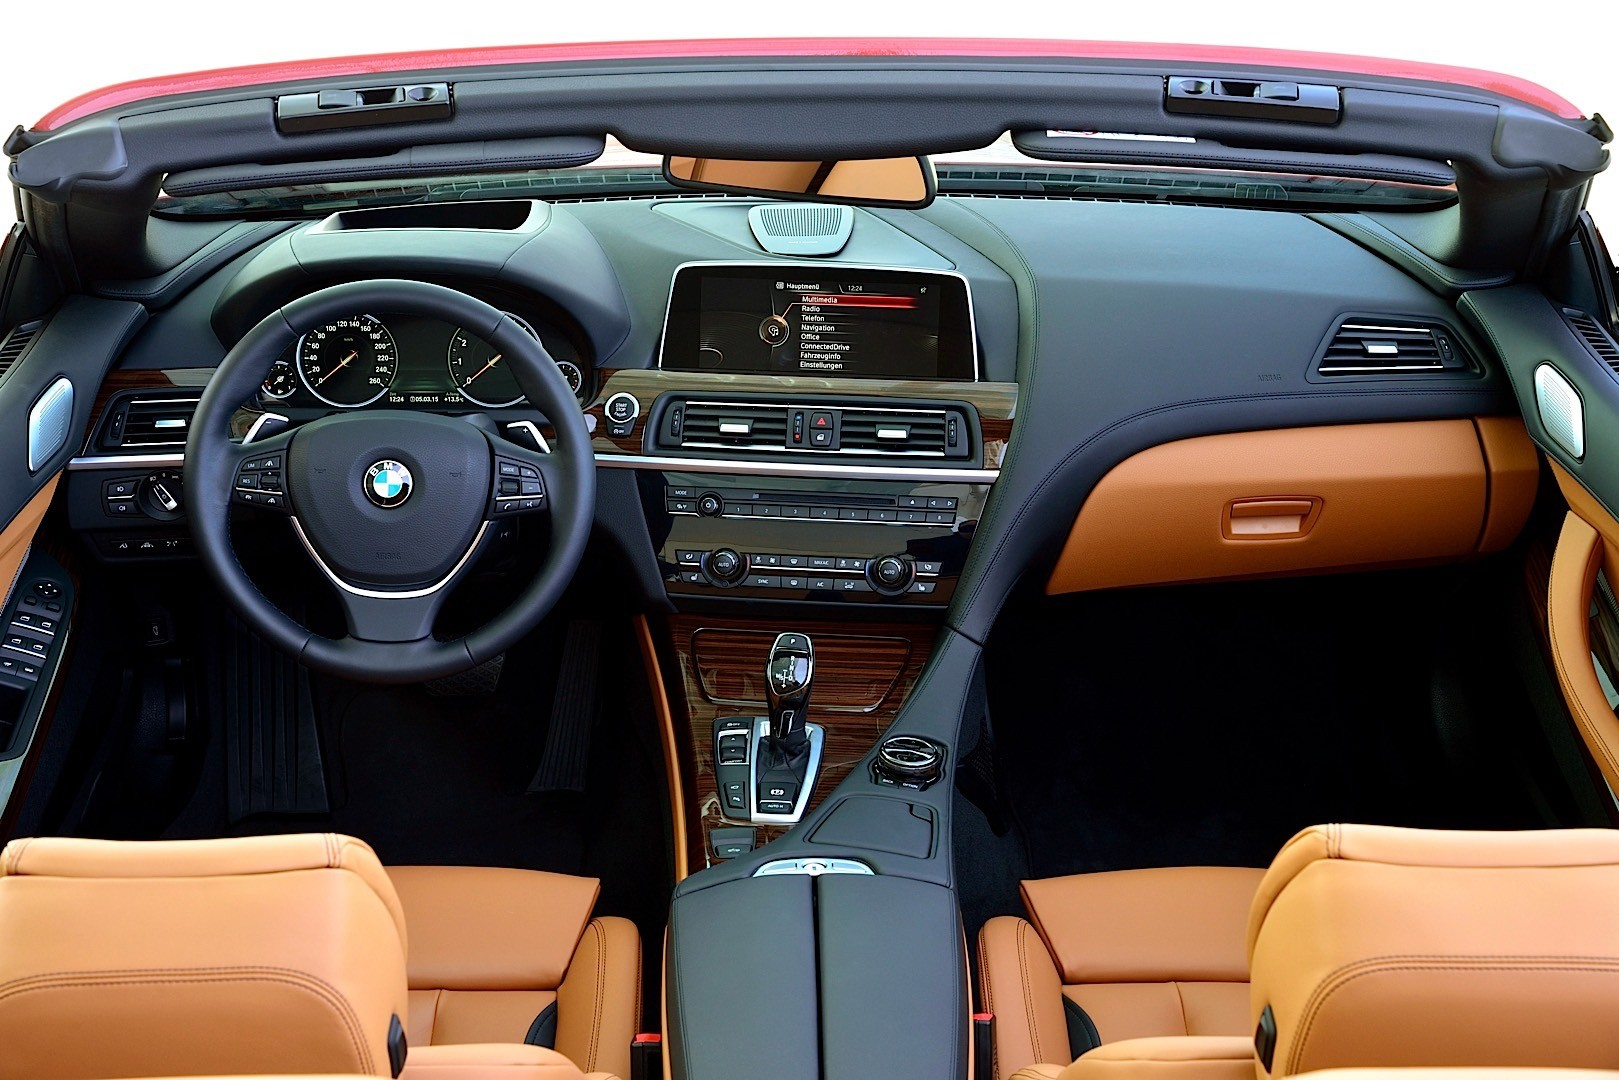 BMW 6 Series Convertible LCI F12 specs  2015 2016 2017